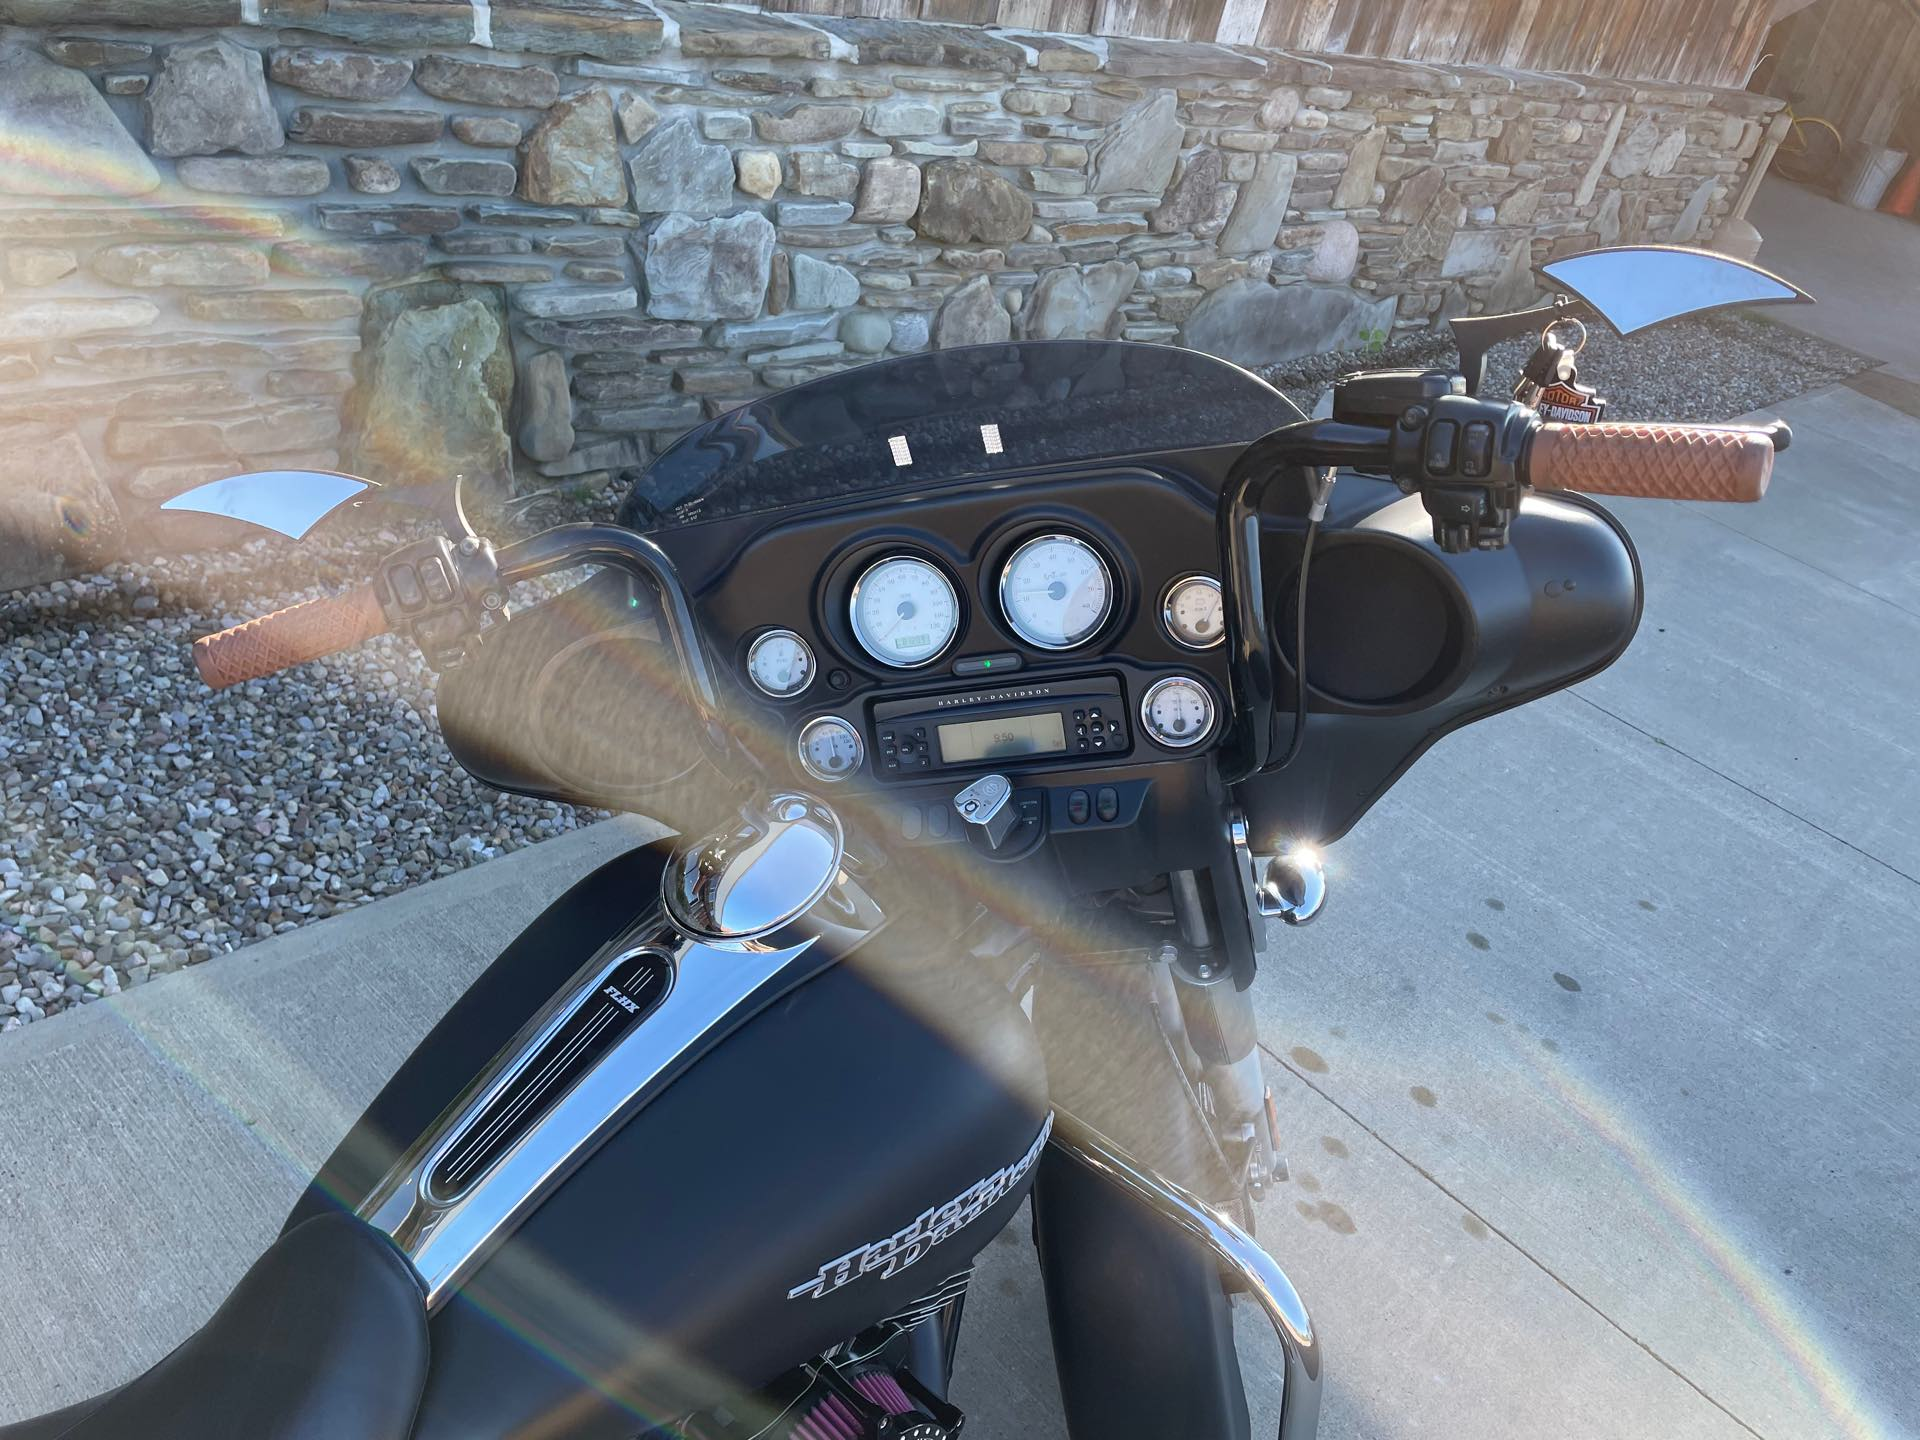 2013 Harley-Davidson Street Glide Base at Arkport Cycles